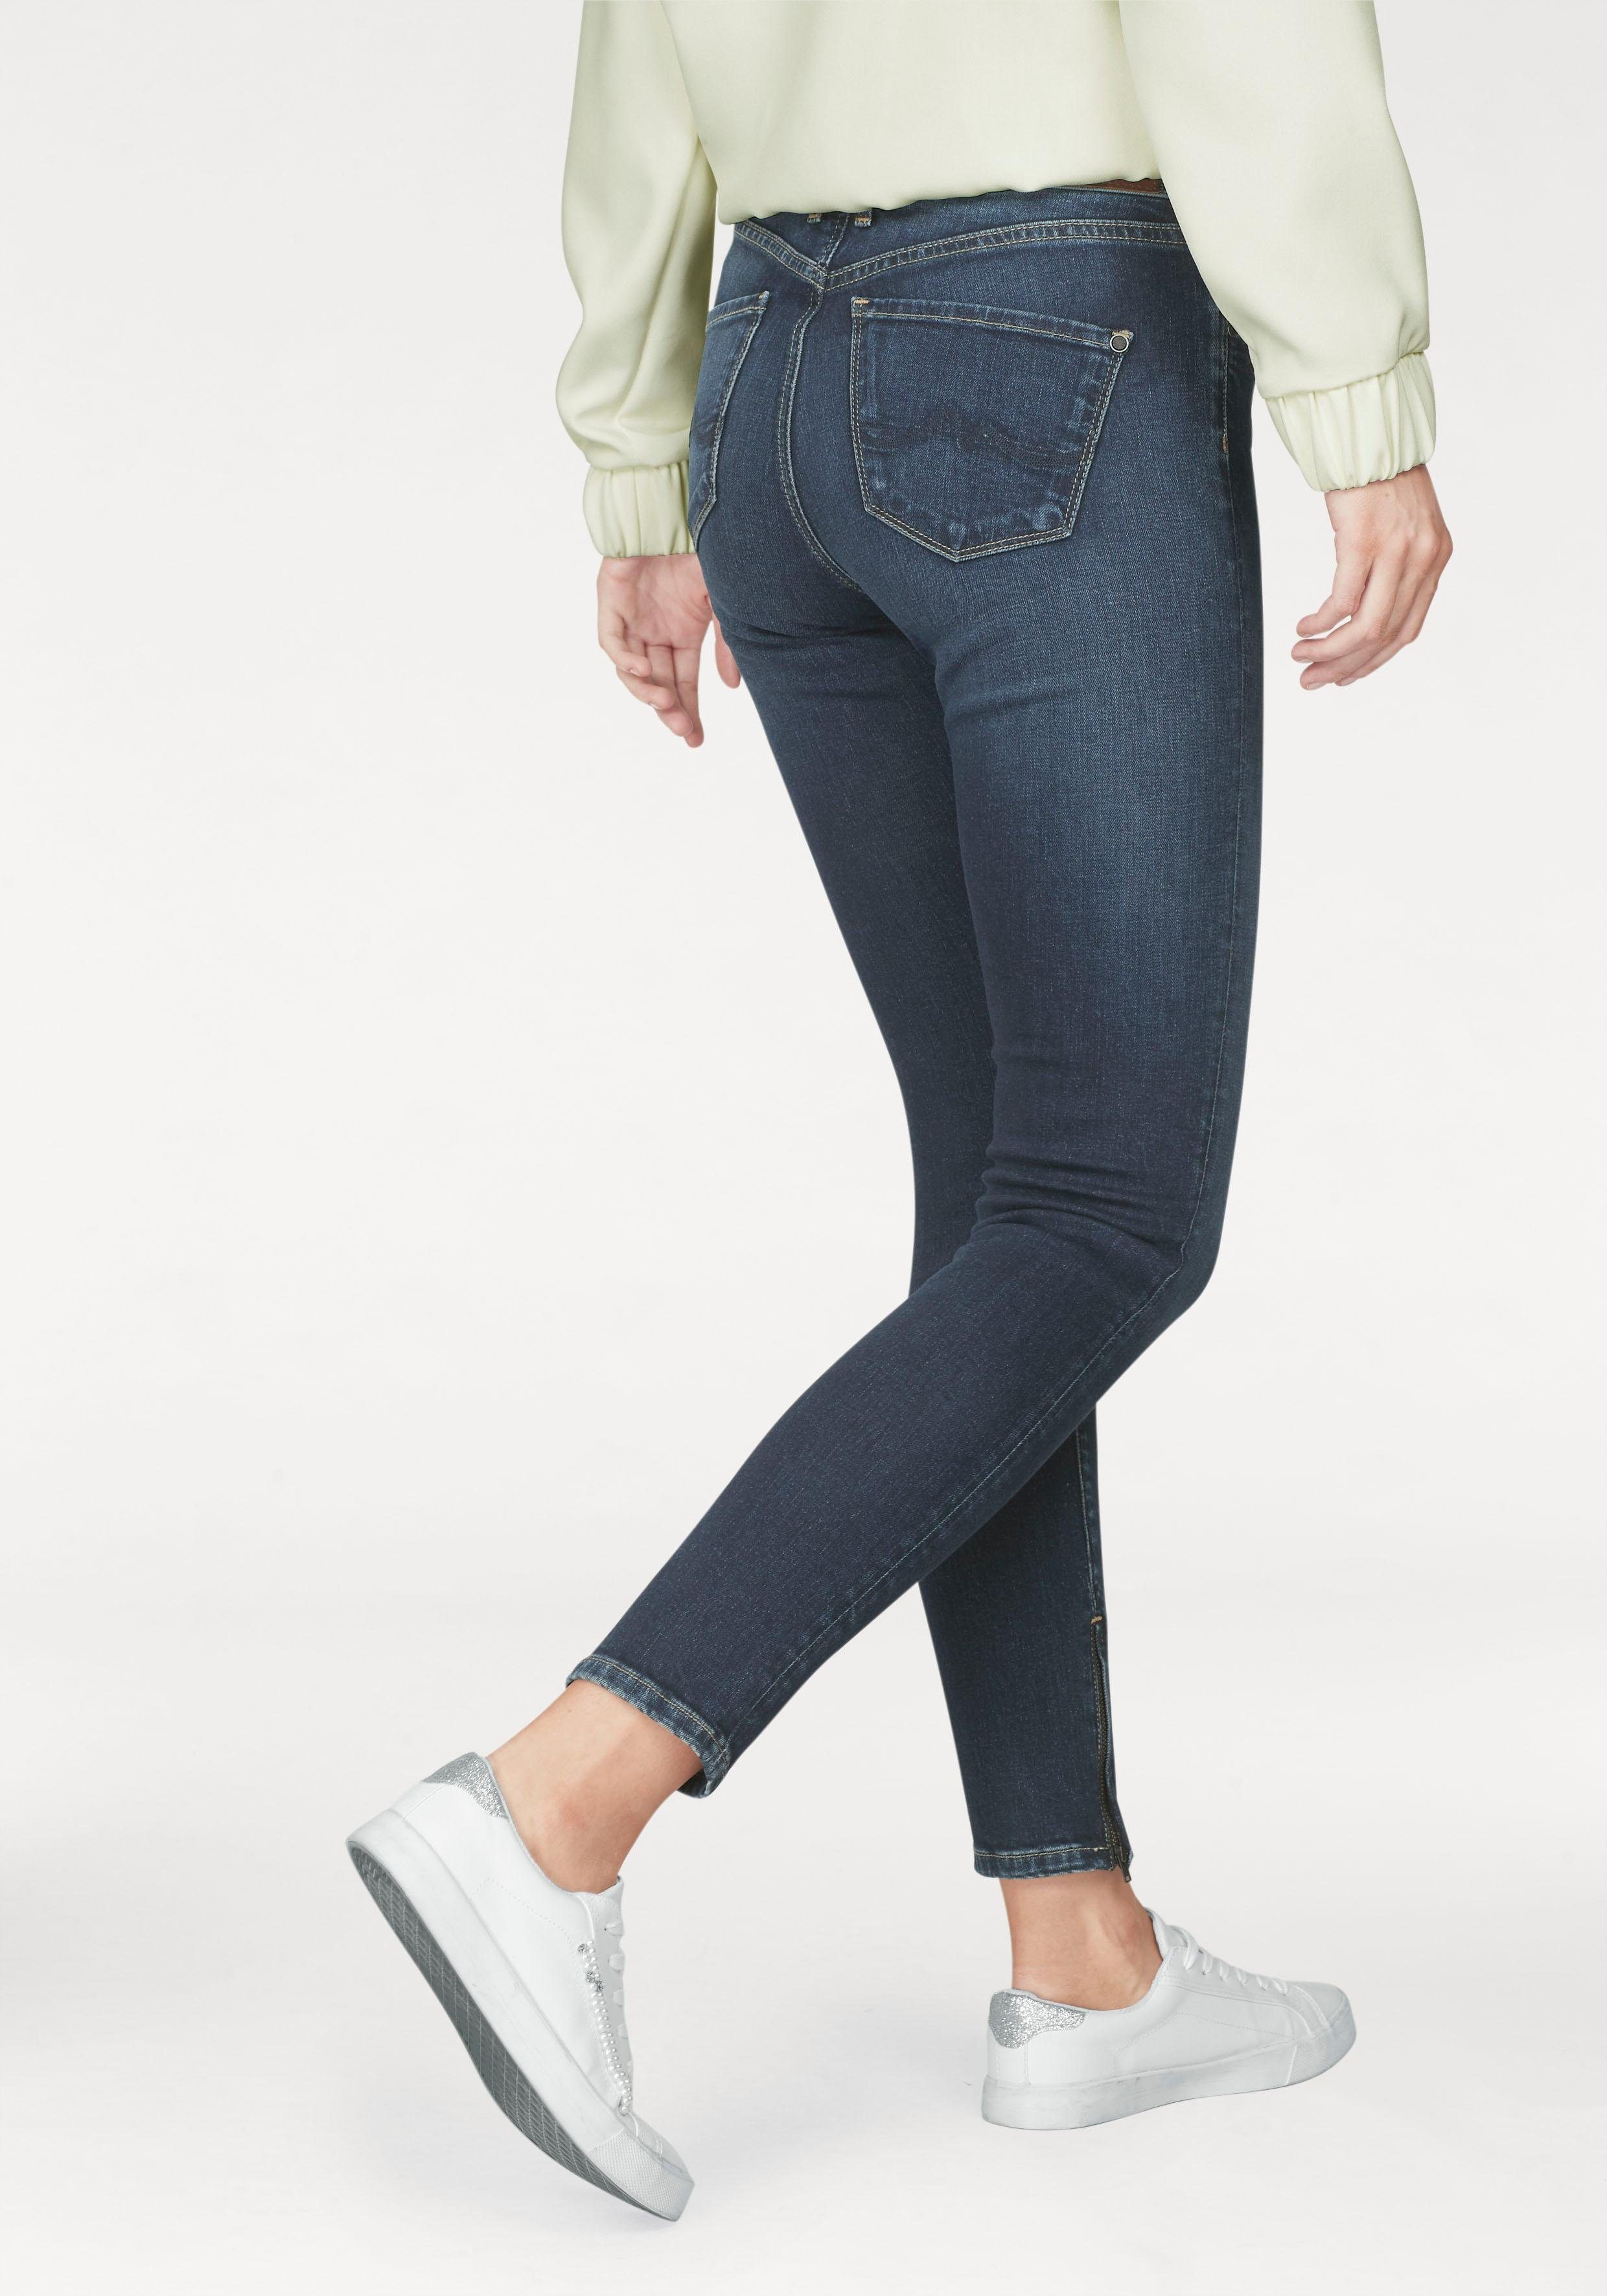 Pepe Jeans Skinny-fit-Jeans »CHER HIGHWAIST«, mit Zip-Detail